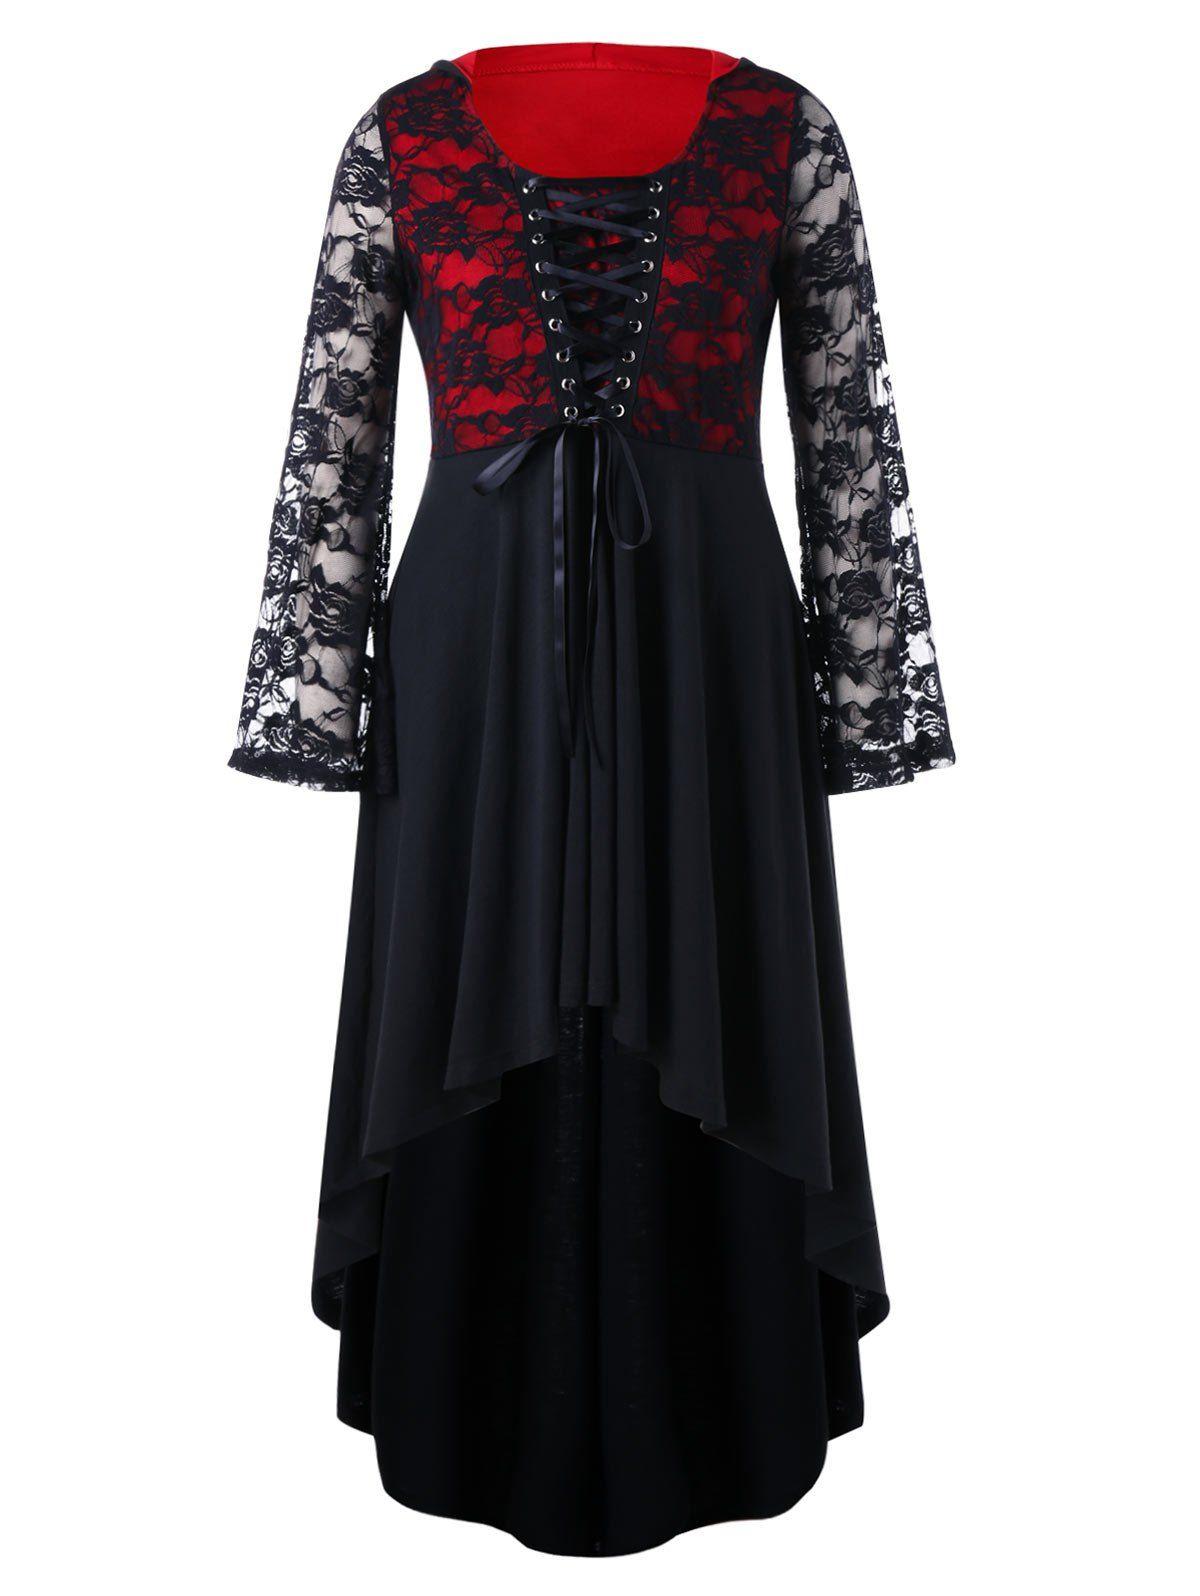 946f1c1da0a9 Cheap Fashion online retailer providing customers trendy and stylish ...